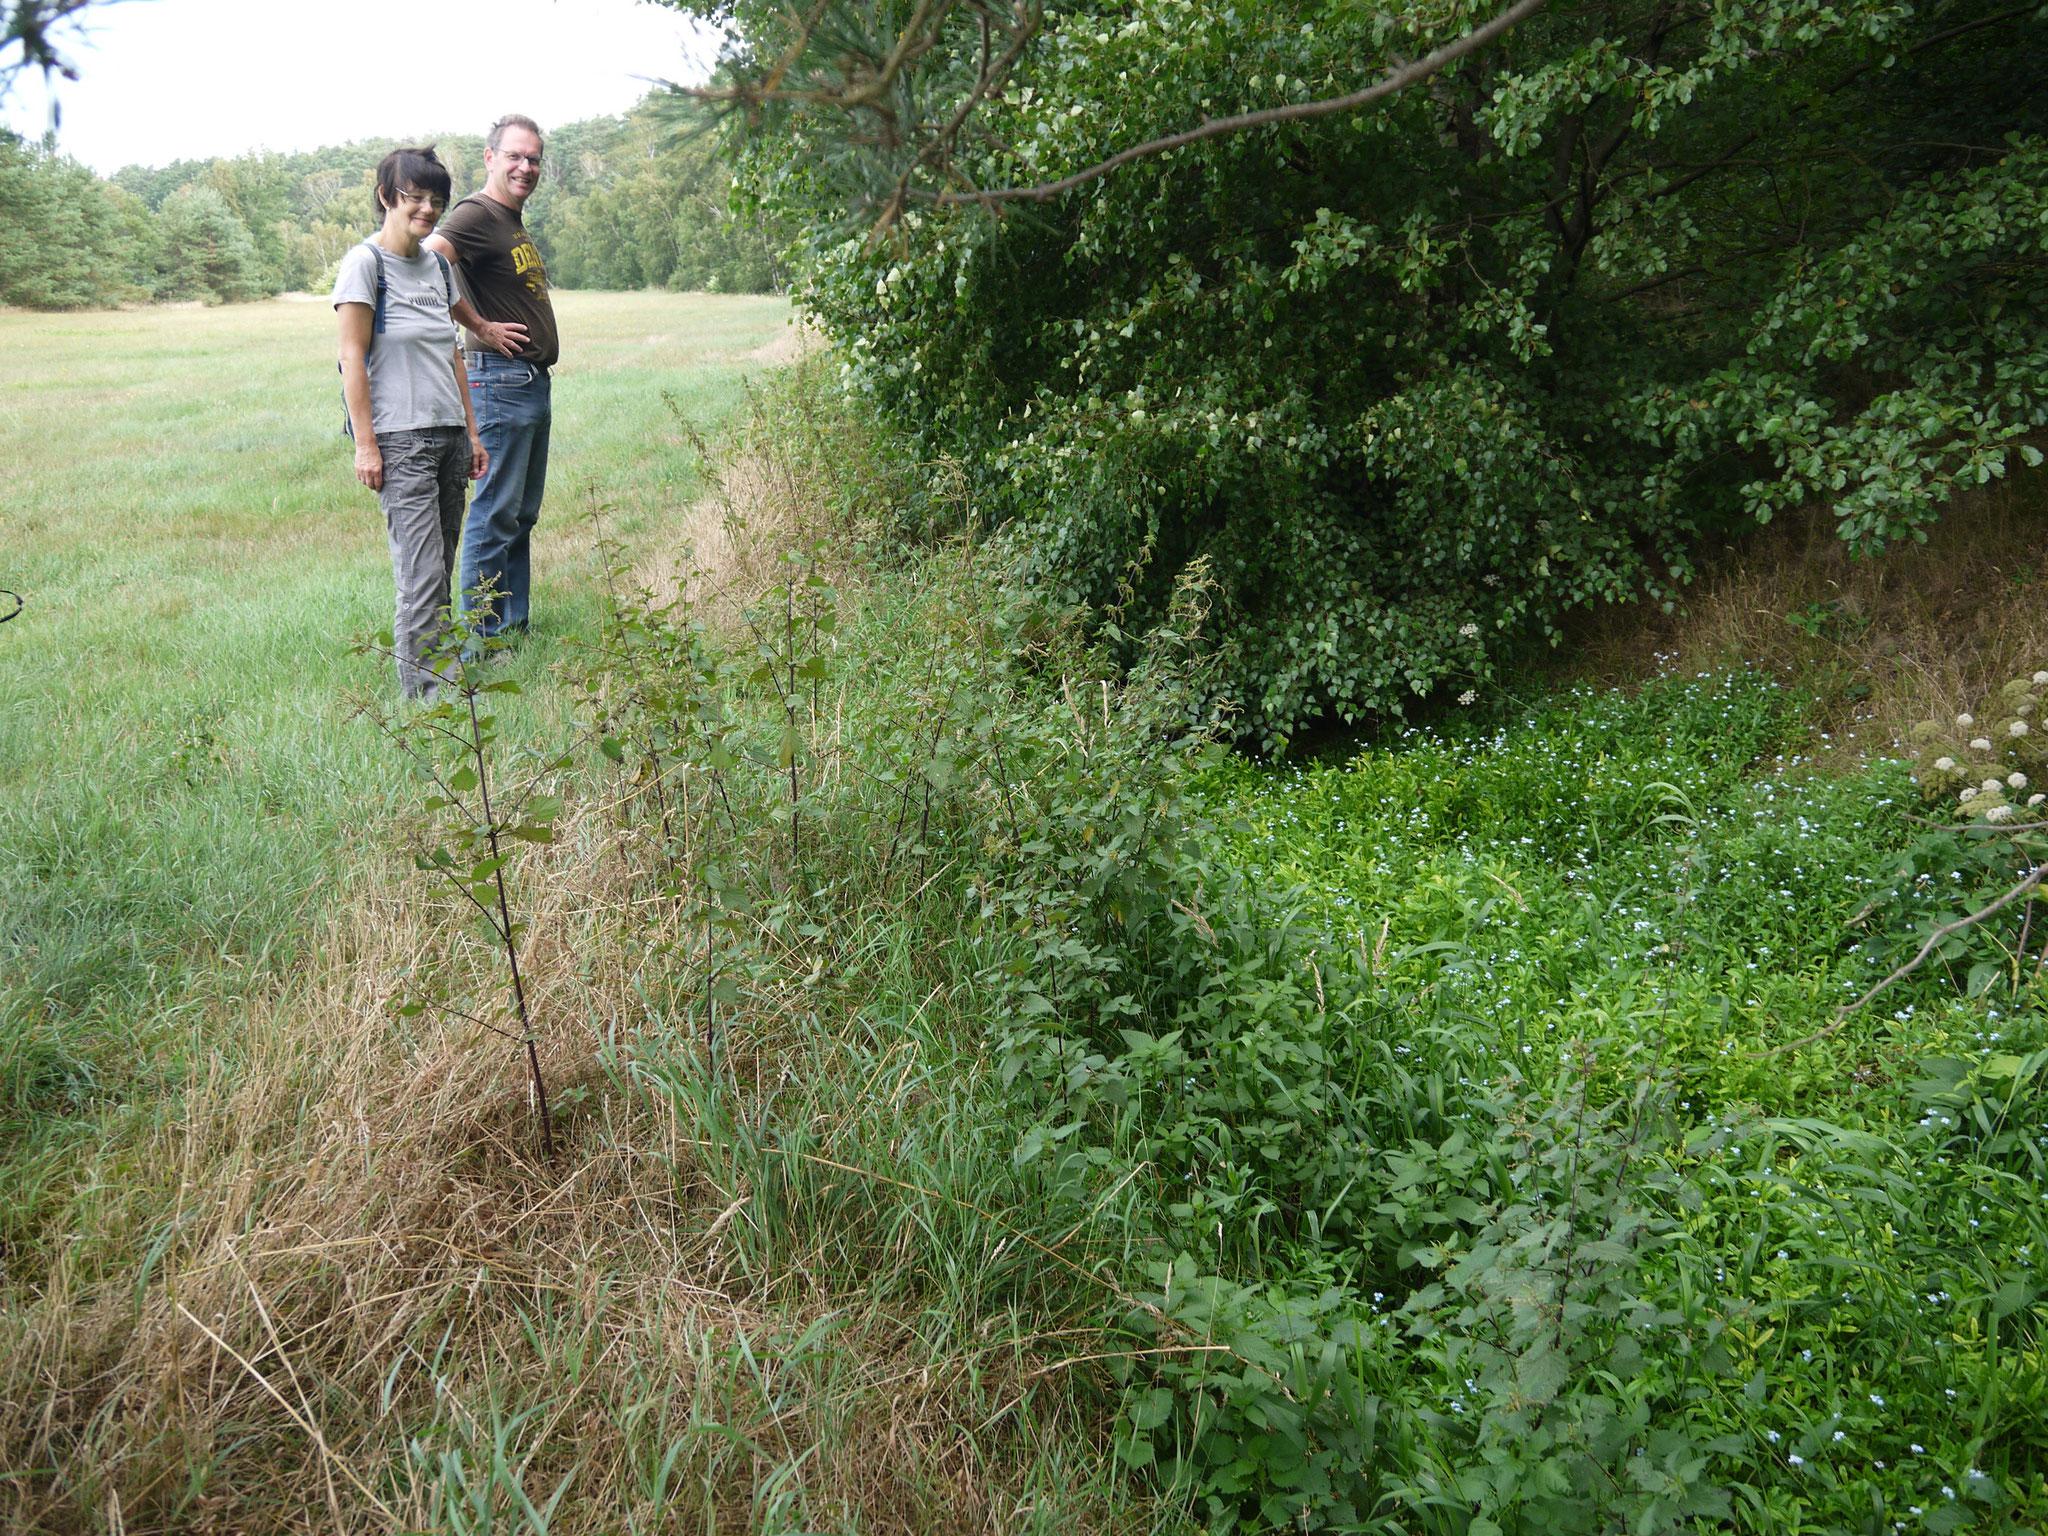 Üppige Vegetation im Krummbek-Bachbett; Foto: Michael Wetzel